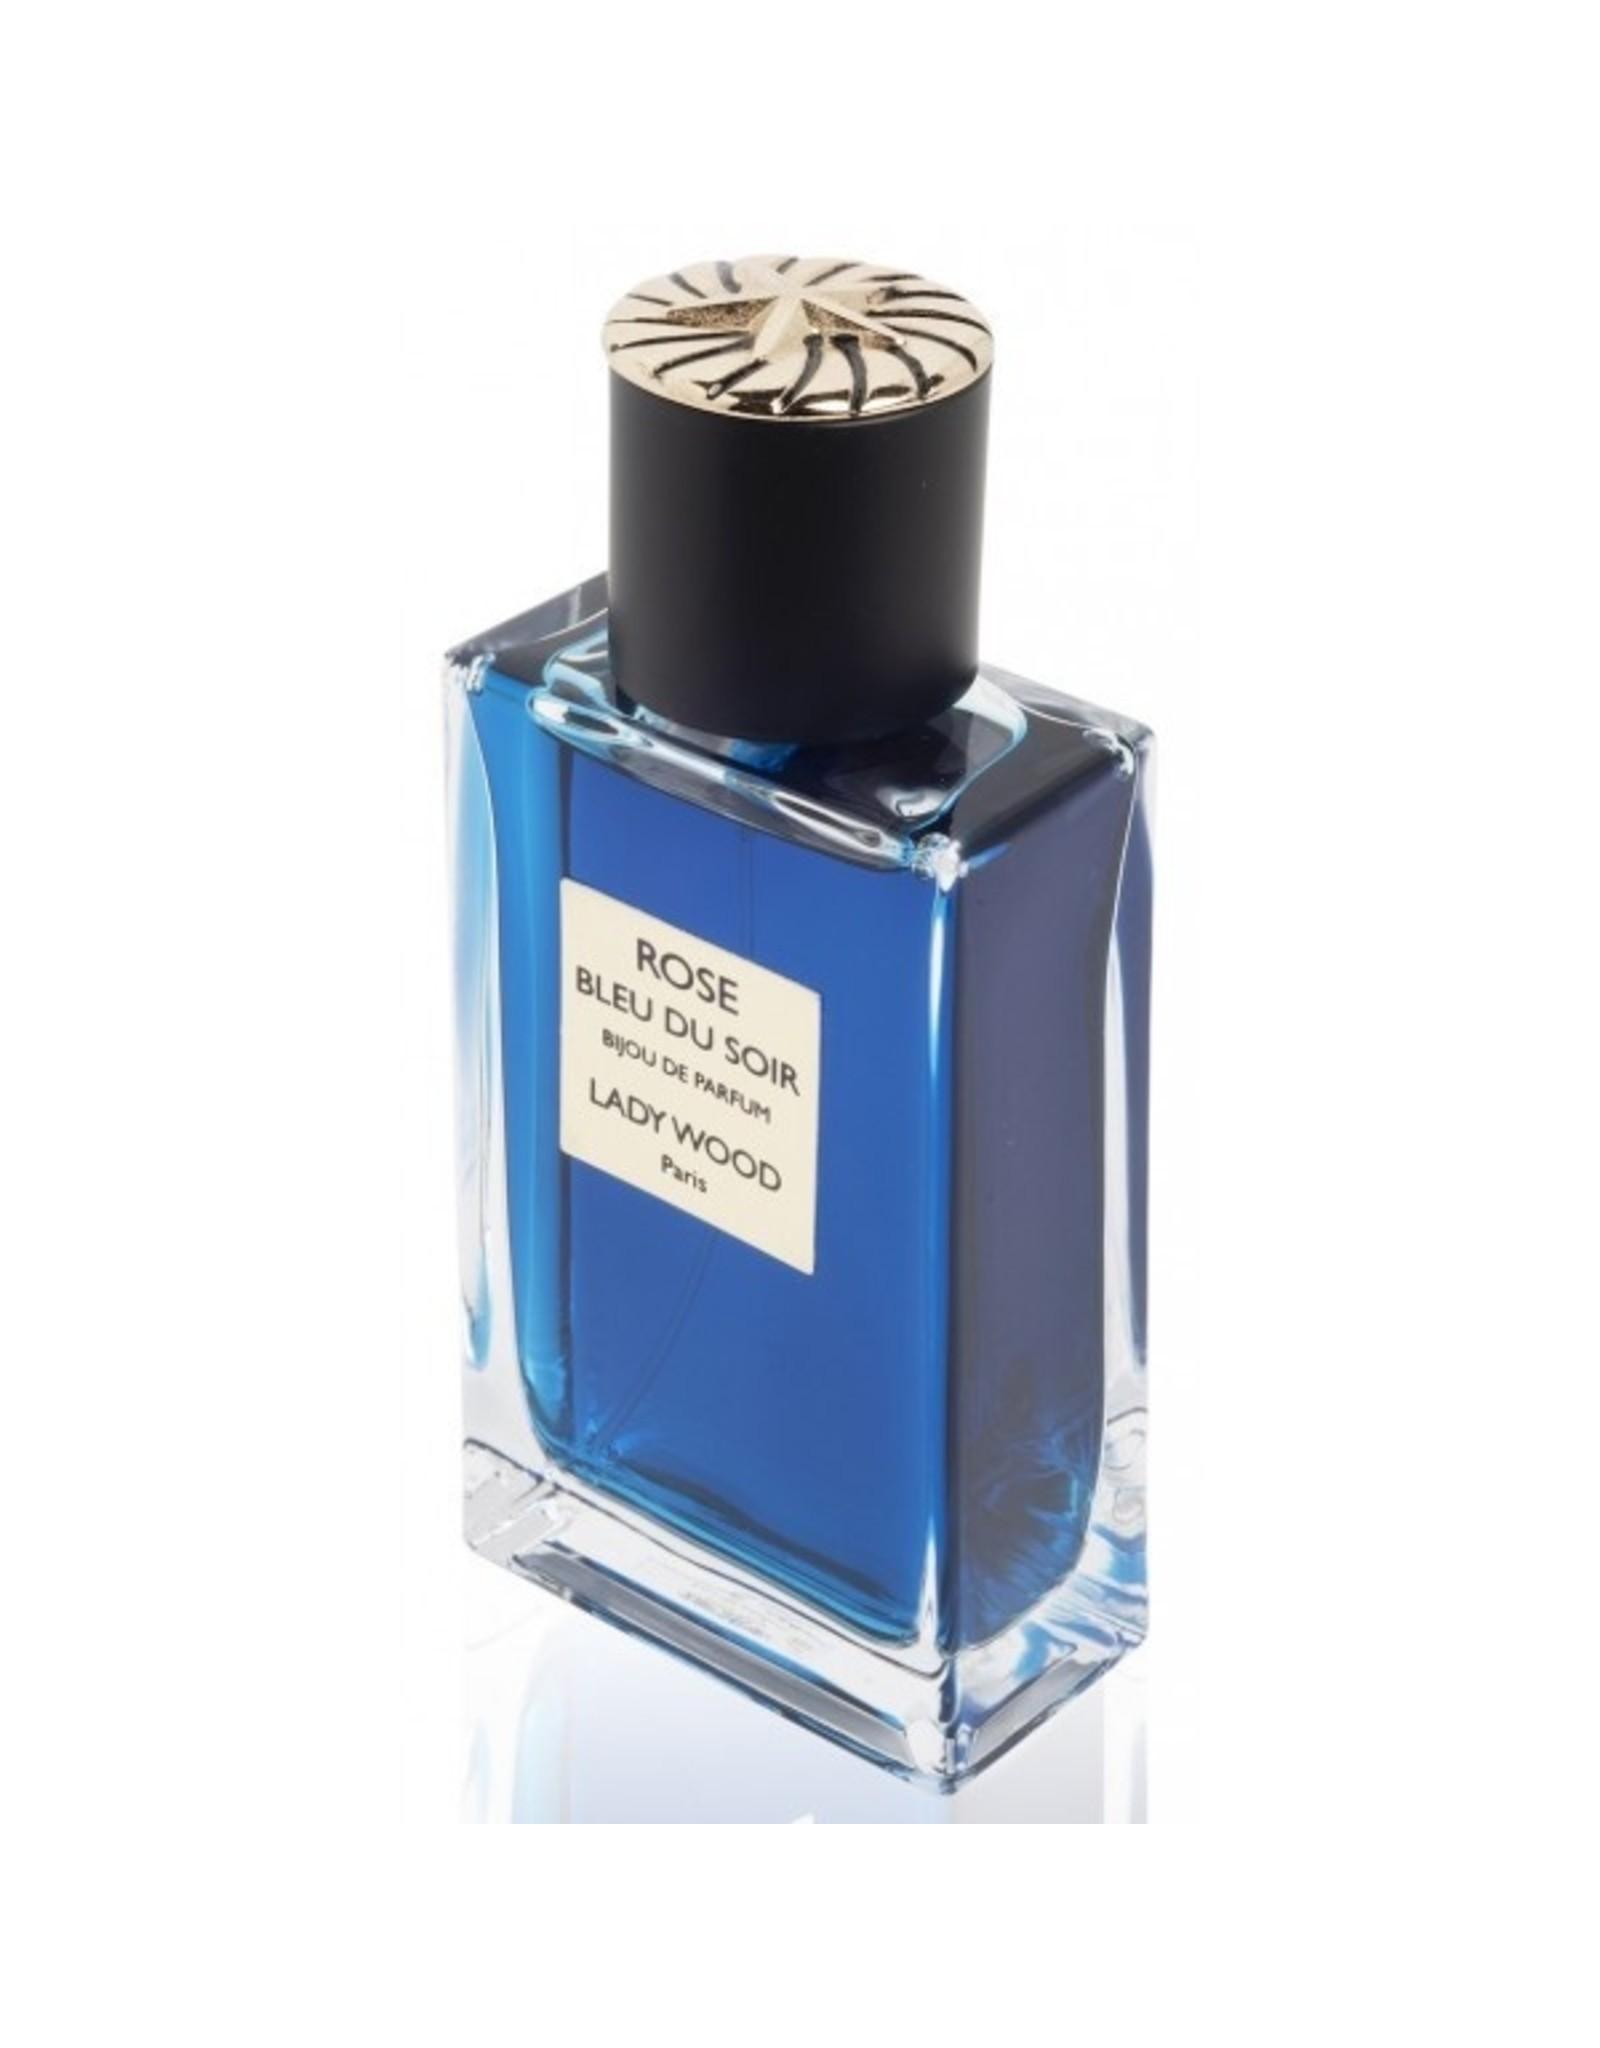 Lady Wood Parfum Lady  Wood  Blue ROSE